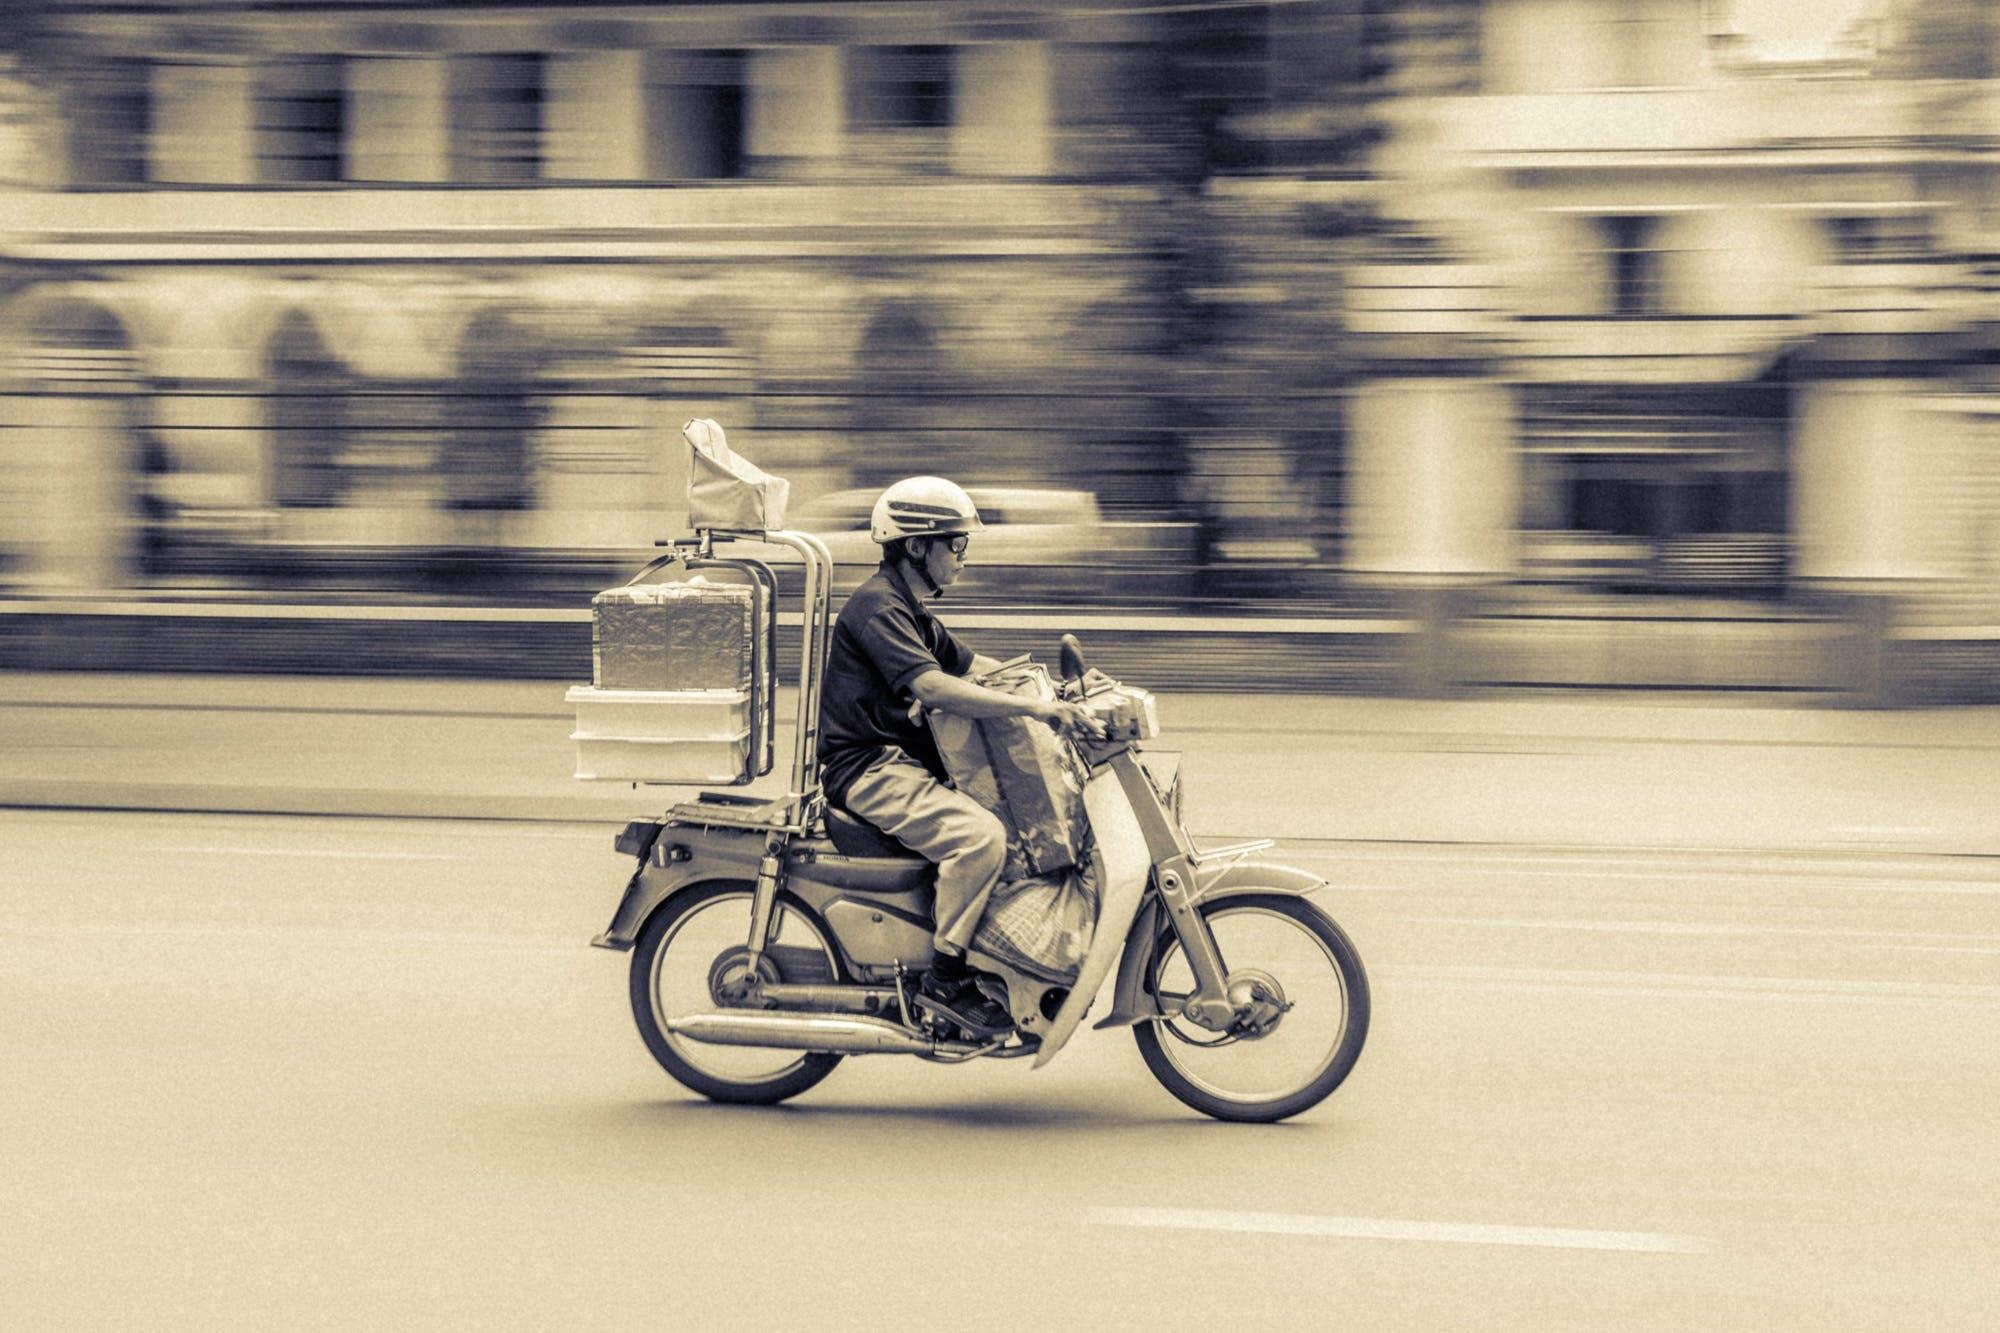 akce, biker, cyklista